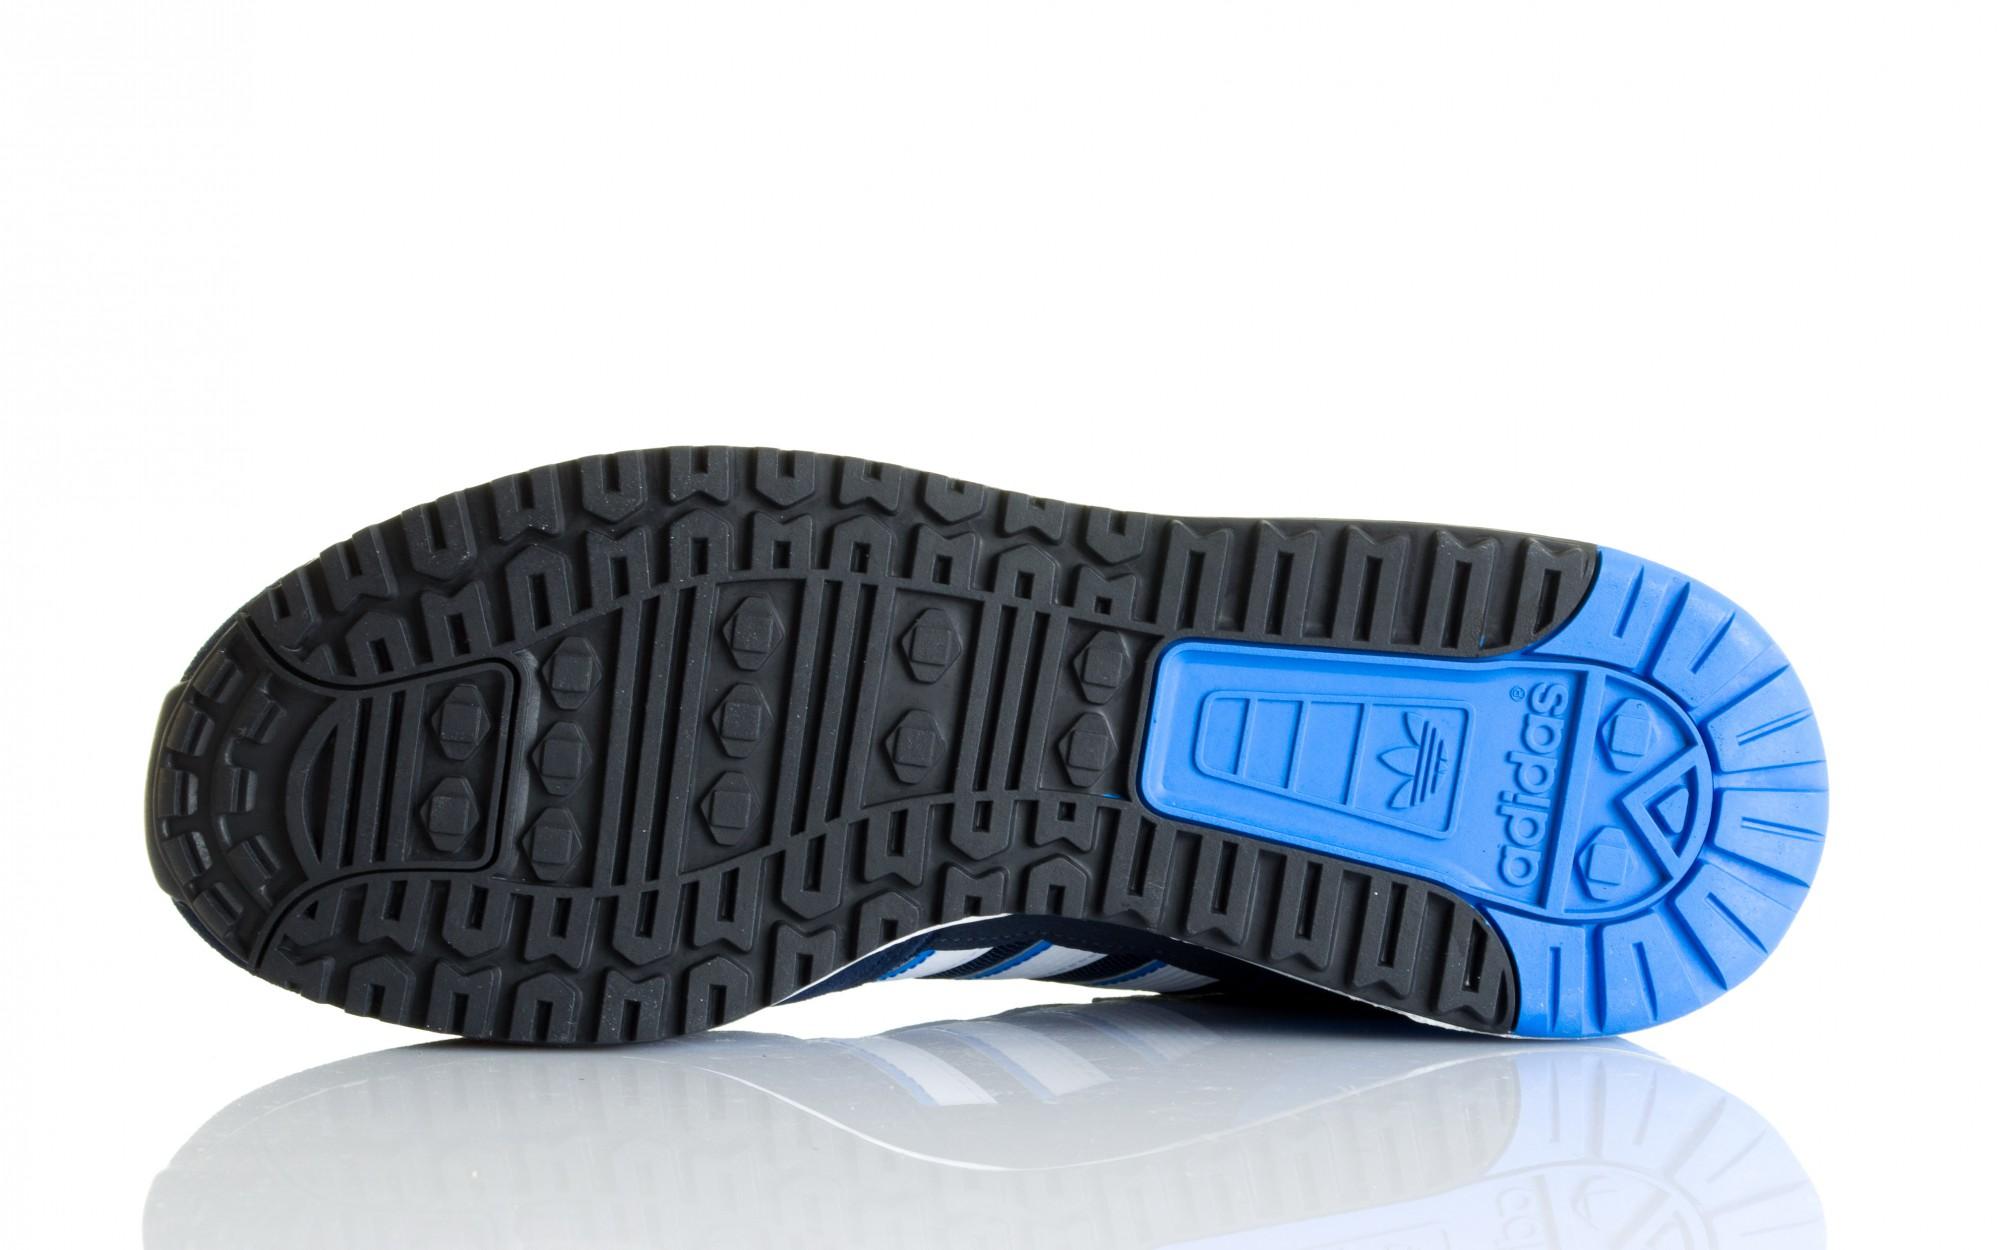 1a01c17cedeed9 Adidas Originals ZX 630 Herren Sneaker Schuh dunkelblau Modell  M25549